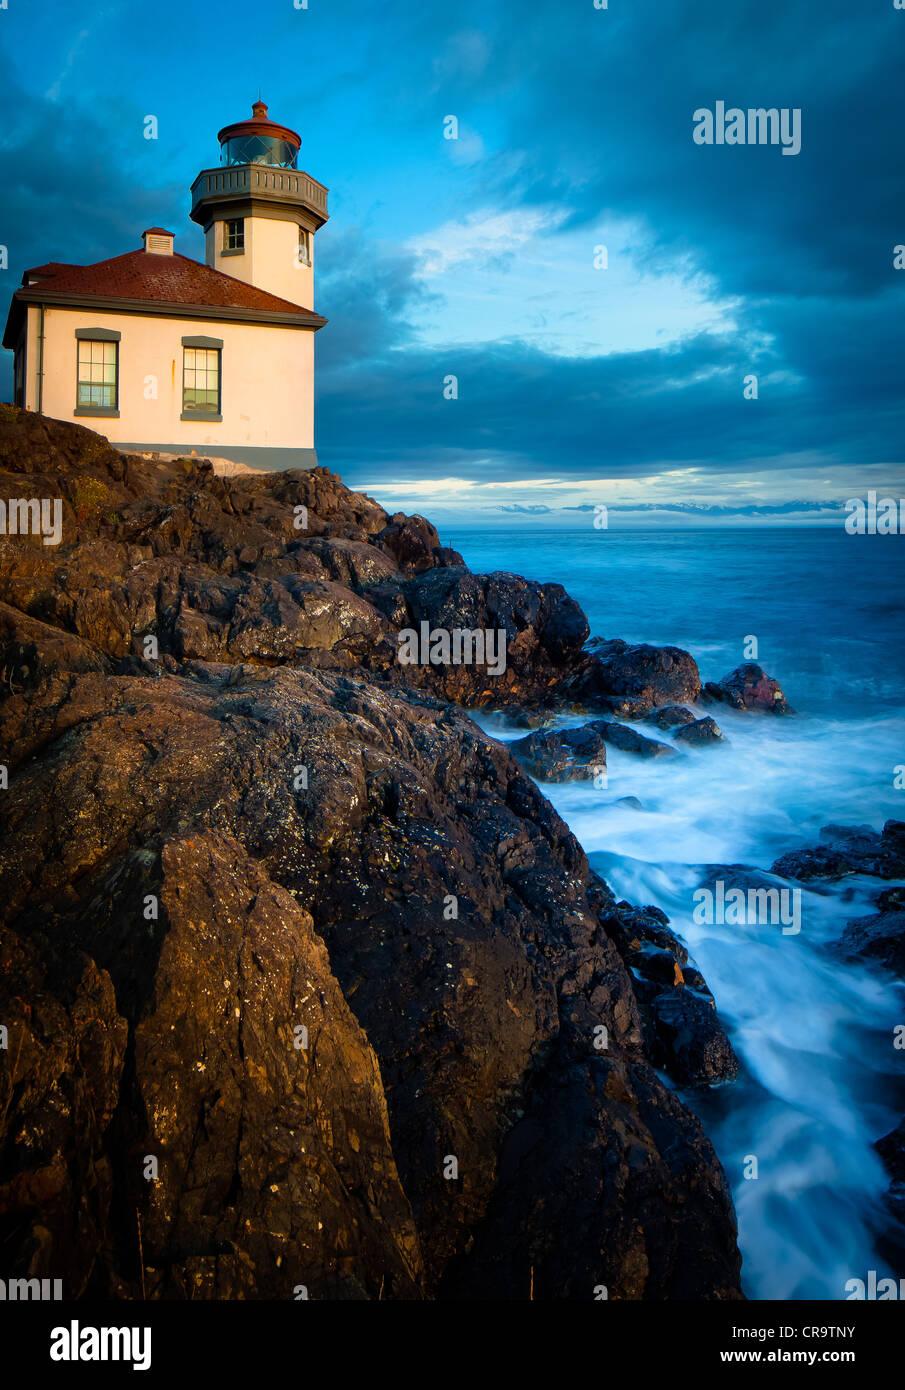 Kalk-Brennofen-Leuchtturm auf San Juan Island, Washington Stockbild